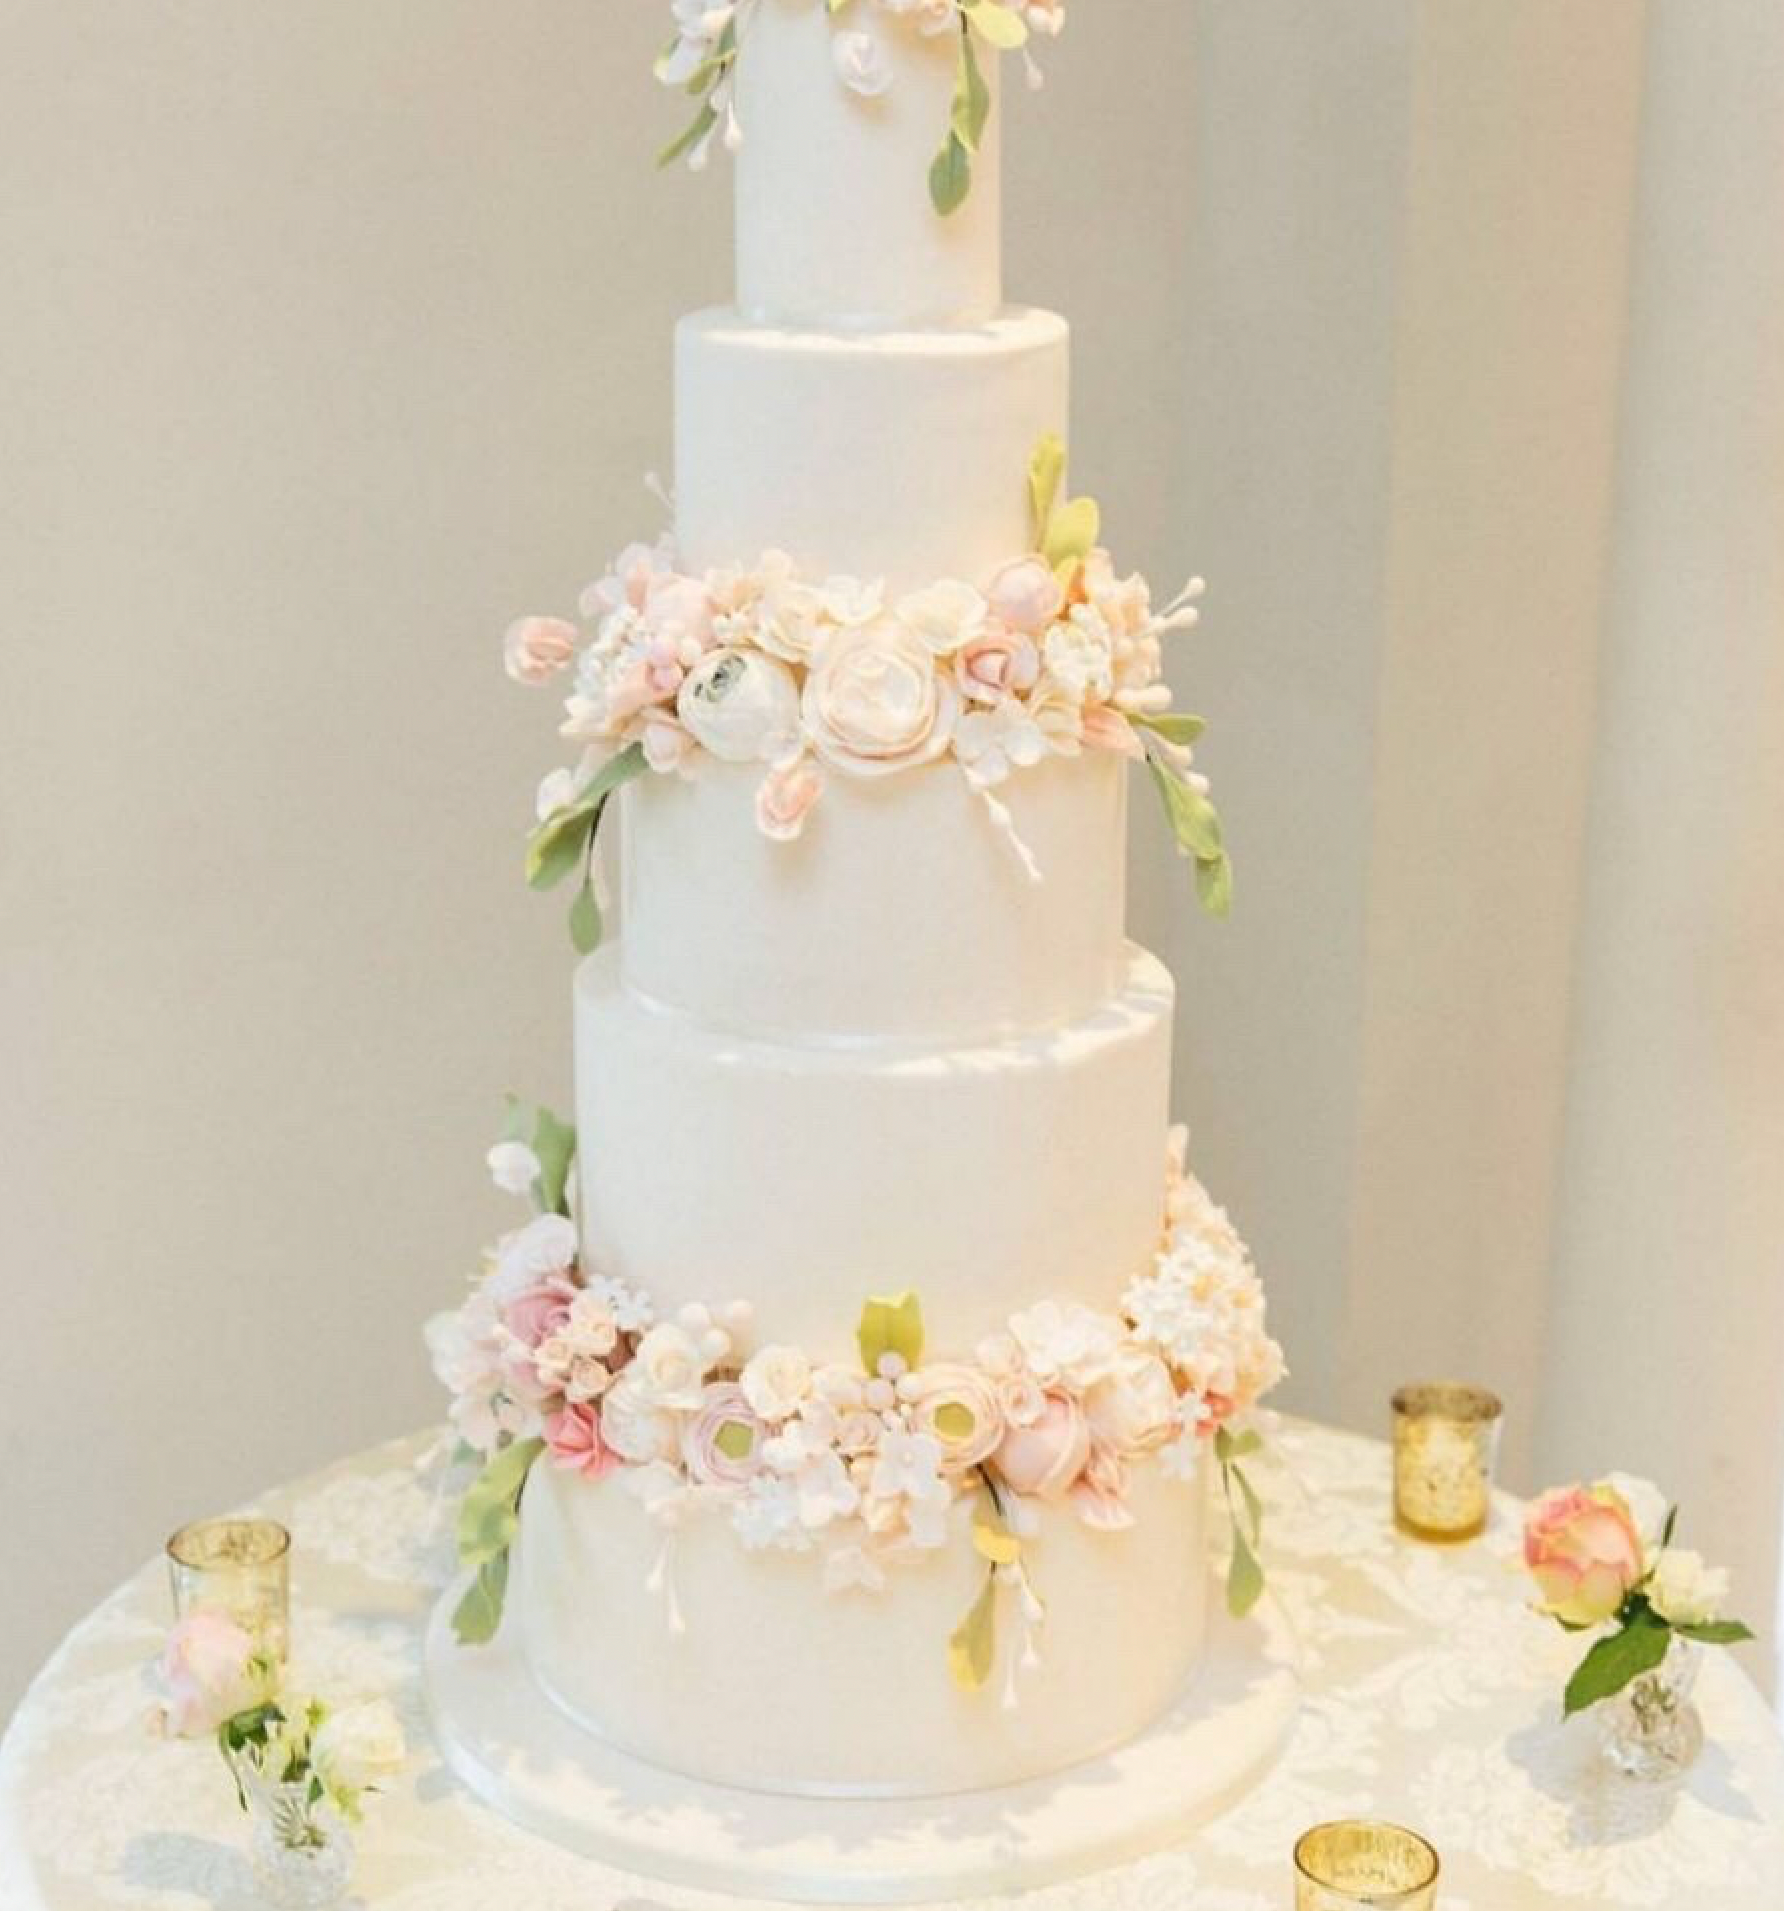 DOTTY ROSE WEDDING CAKE DESIGN 5 TIER SUGARCRAFT FLORALS.png